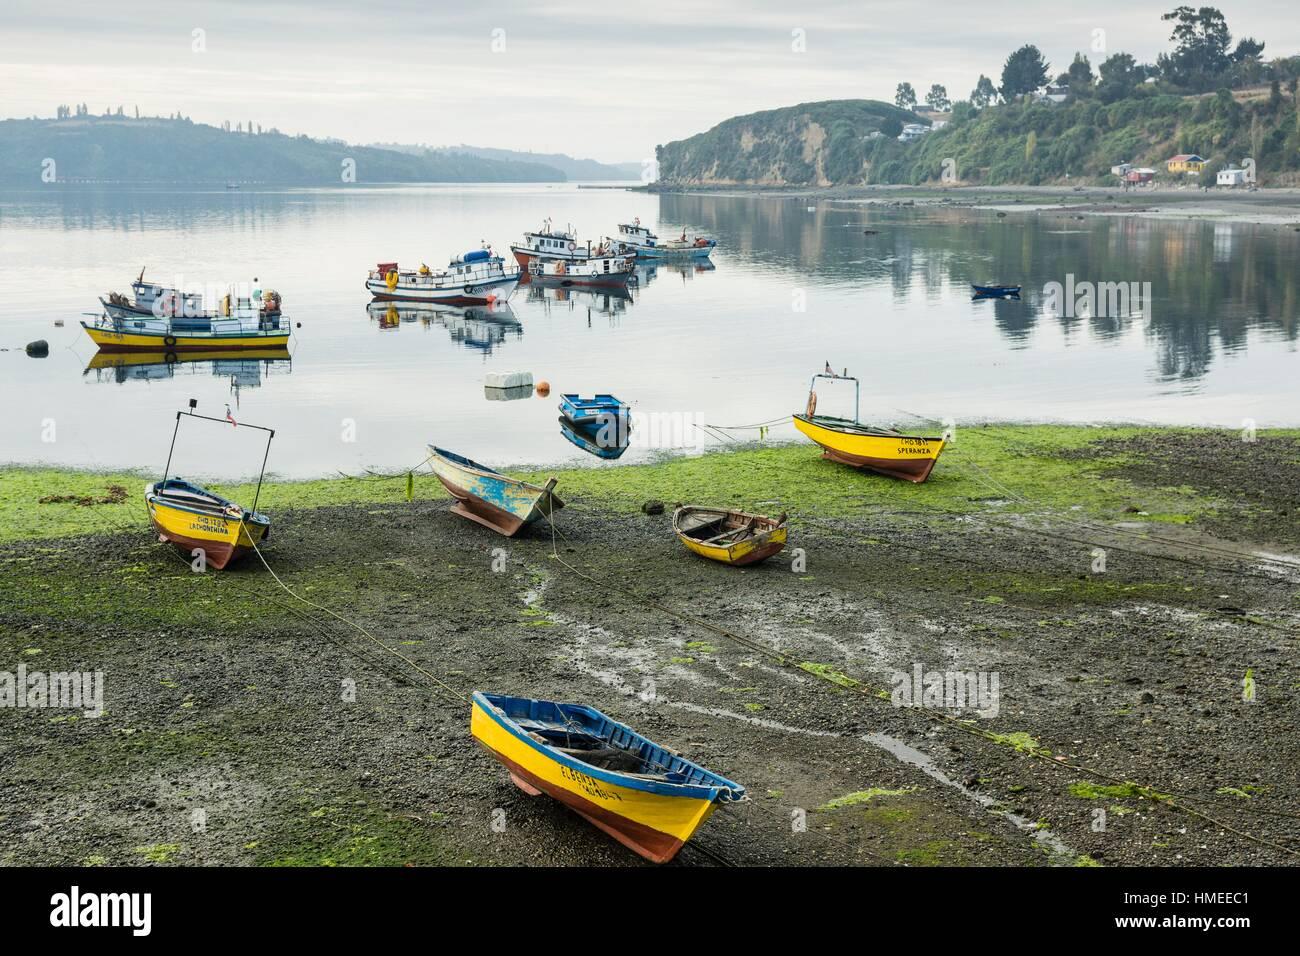 Chonchi, archipiélago de Chiloé ,provincia de Chiloé ,región de Los Lagos,Patagonia, República de Chile,América Stock Photo